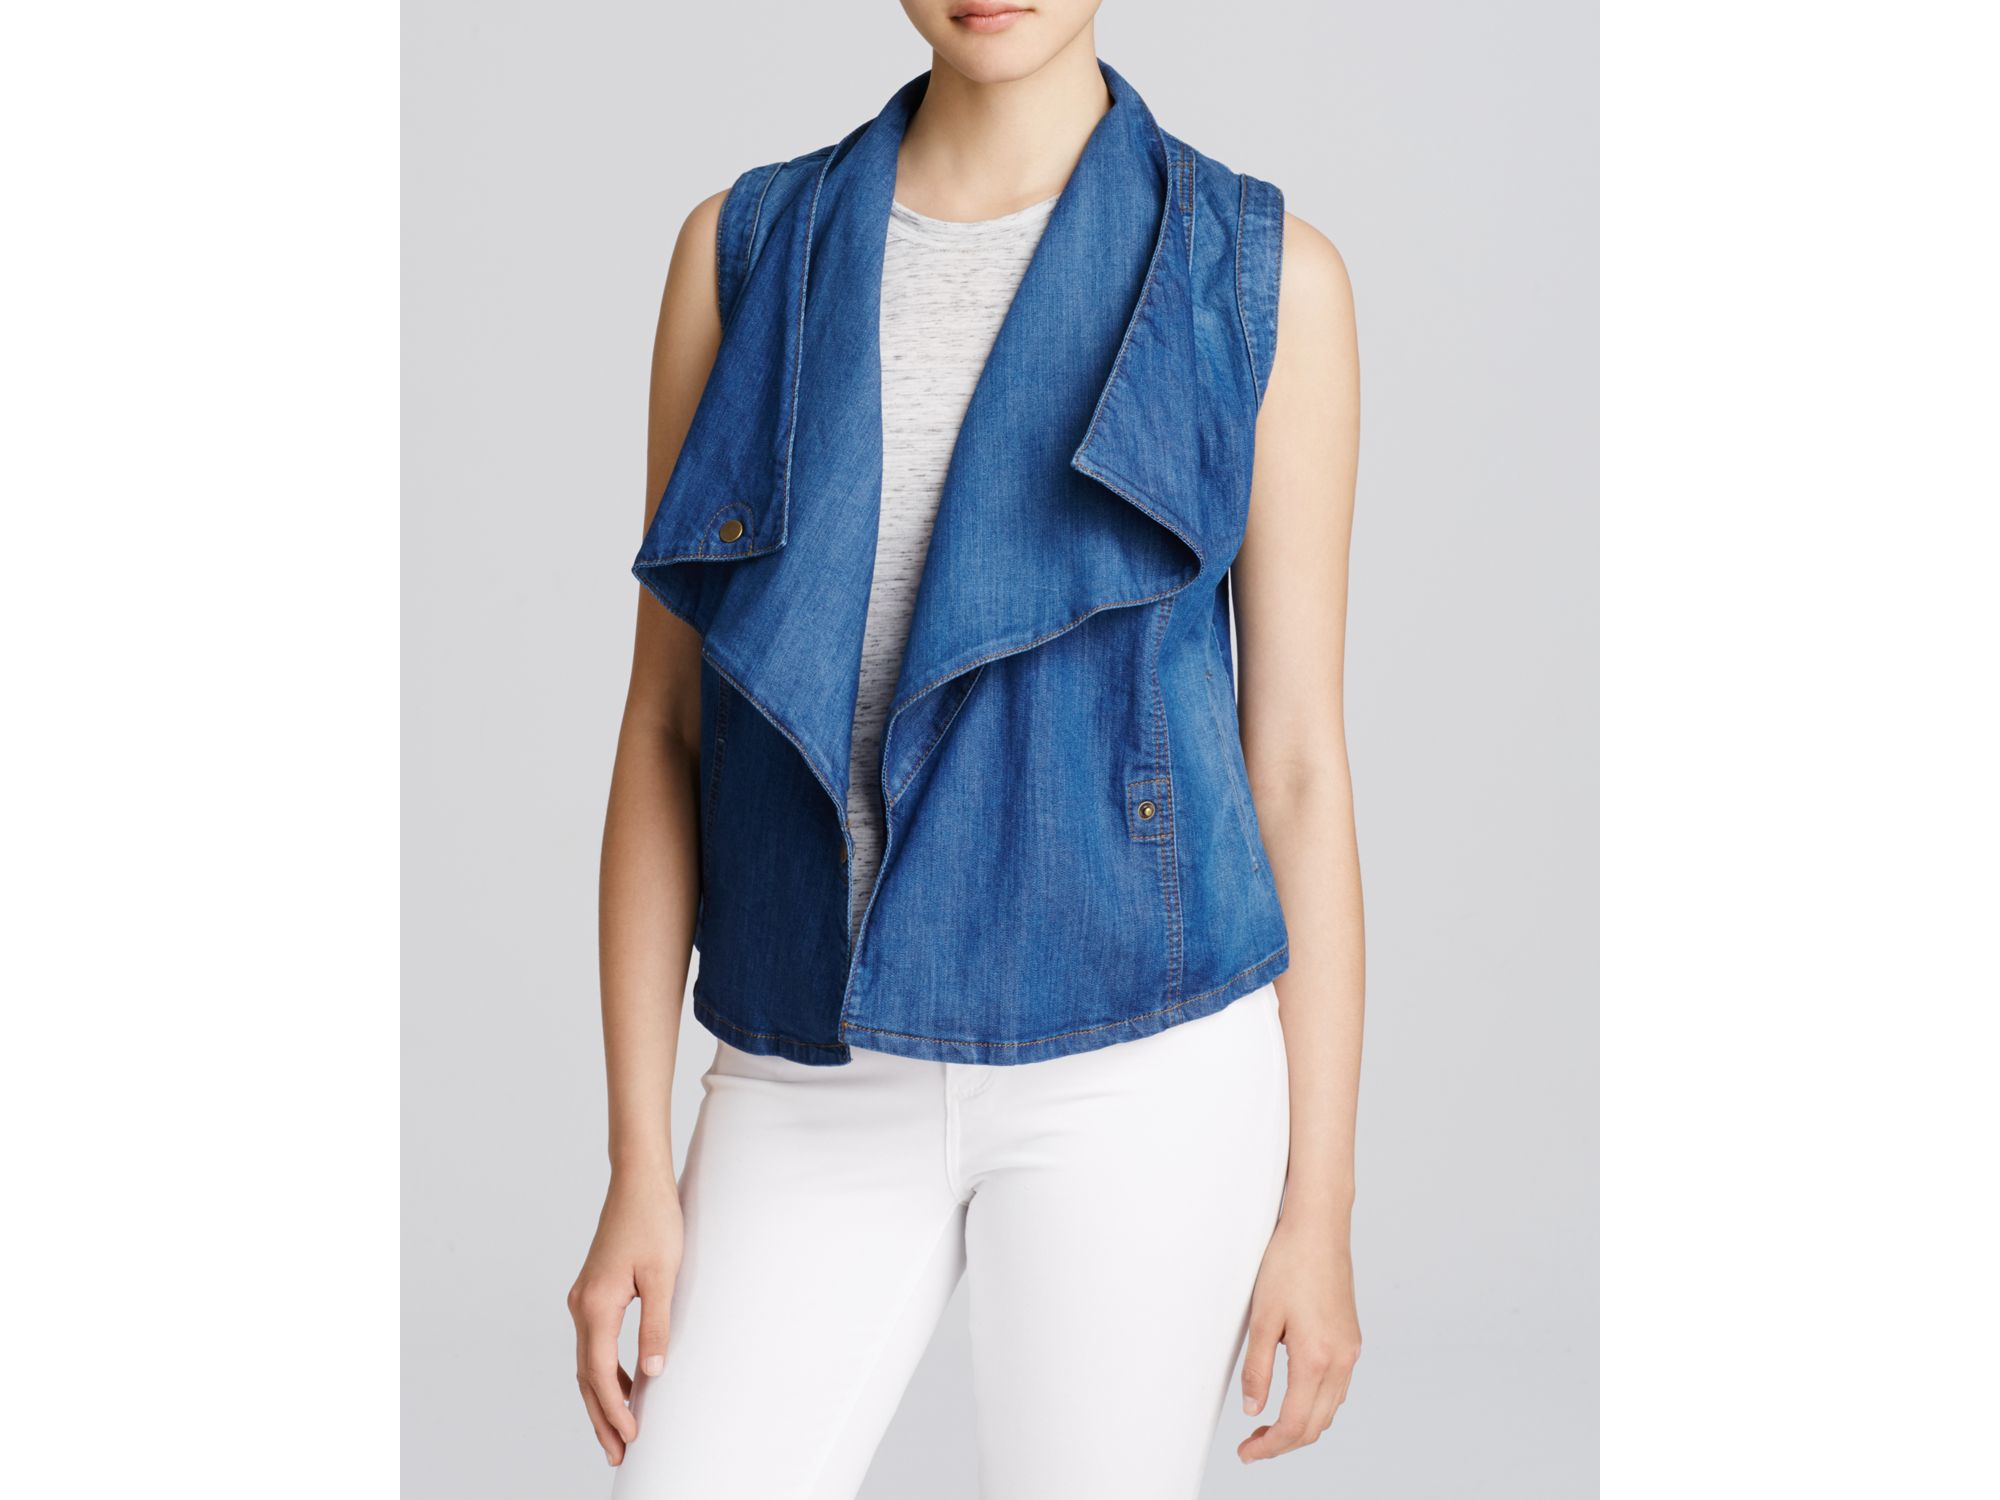 ff1461f3033132 Lyst - Kut From The Kloth Drape-front Denim Vest in Blue